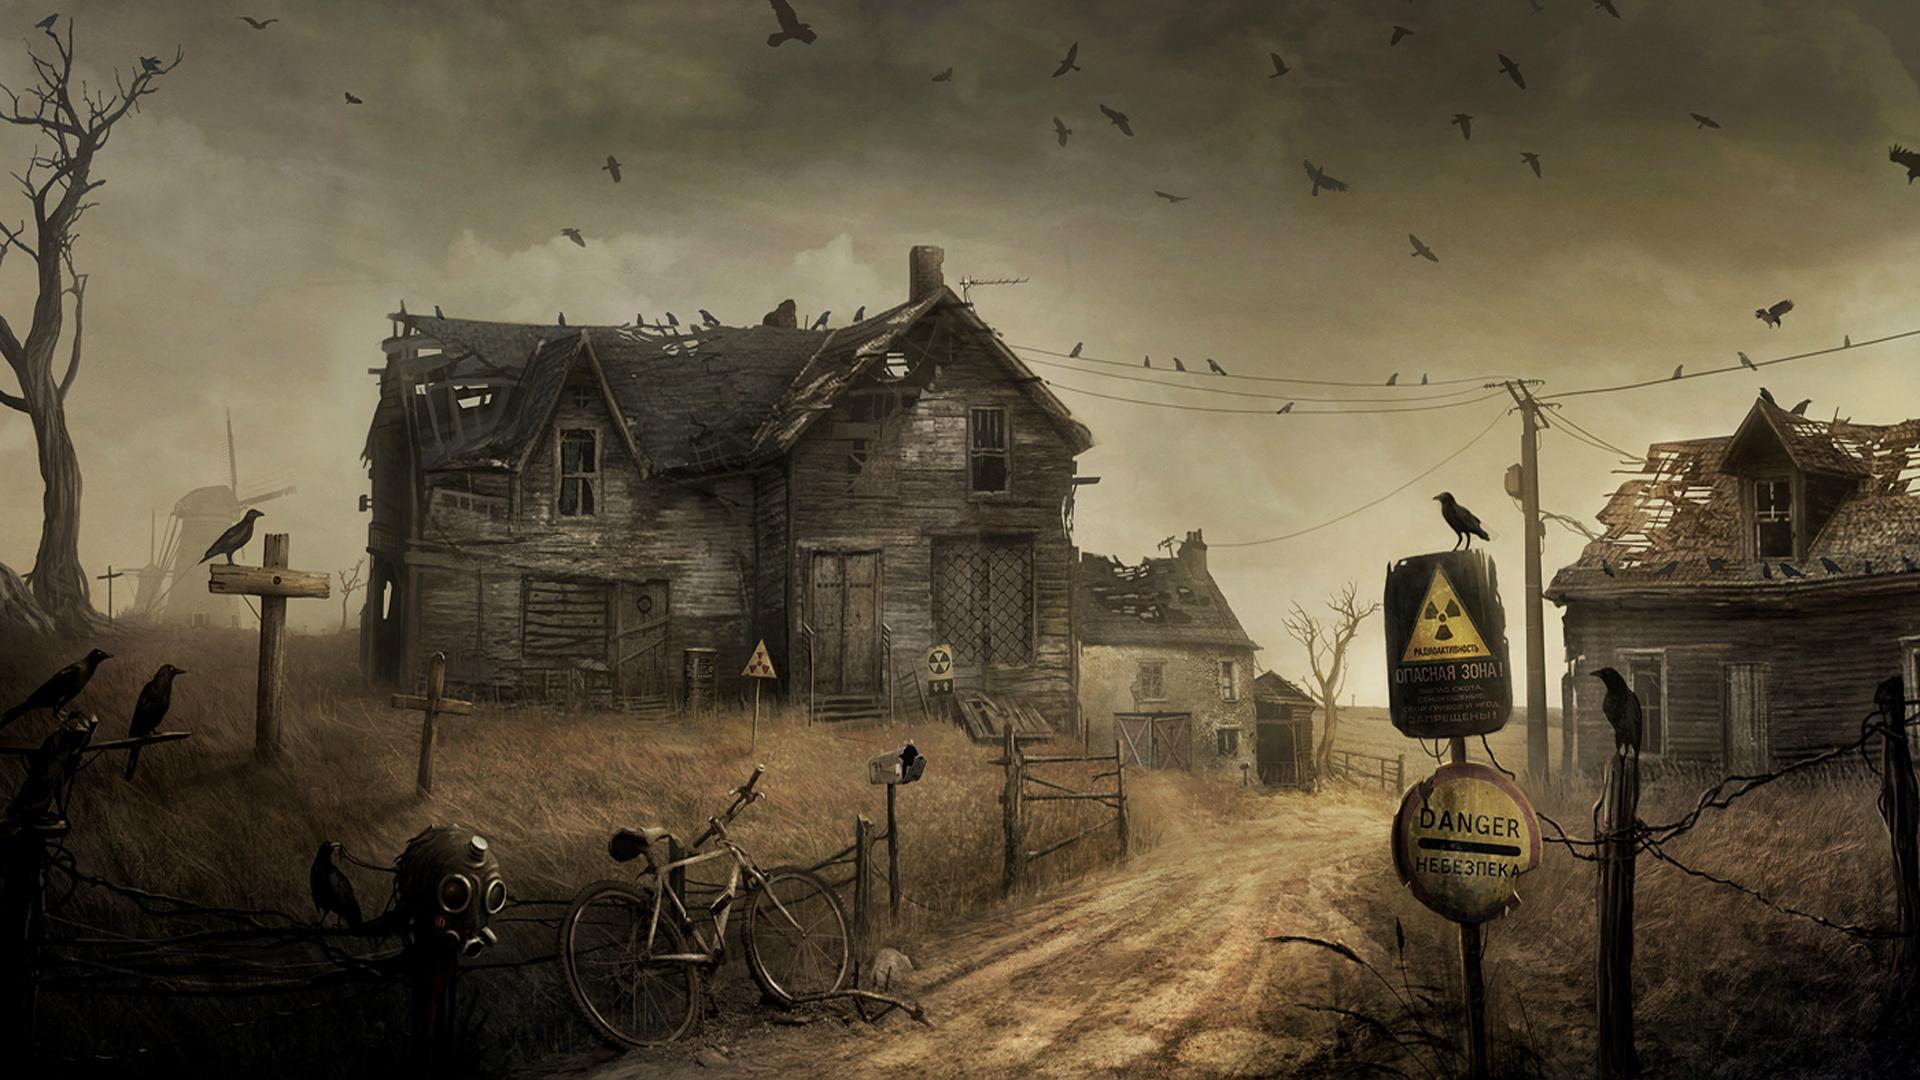 Best Wallpaper Halloween Haunted - 1920x1080-px-apocalypse-apocalyptic-bicycle-birds-creepy-crows-dark-destruction-evil-gas-Halloween-haunted-horror-houses-mask-post-radiation-ravens-roads-ruins-spooky-805775  Photograph_573121.jpg